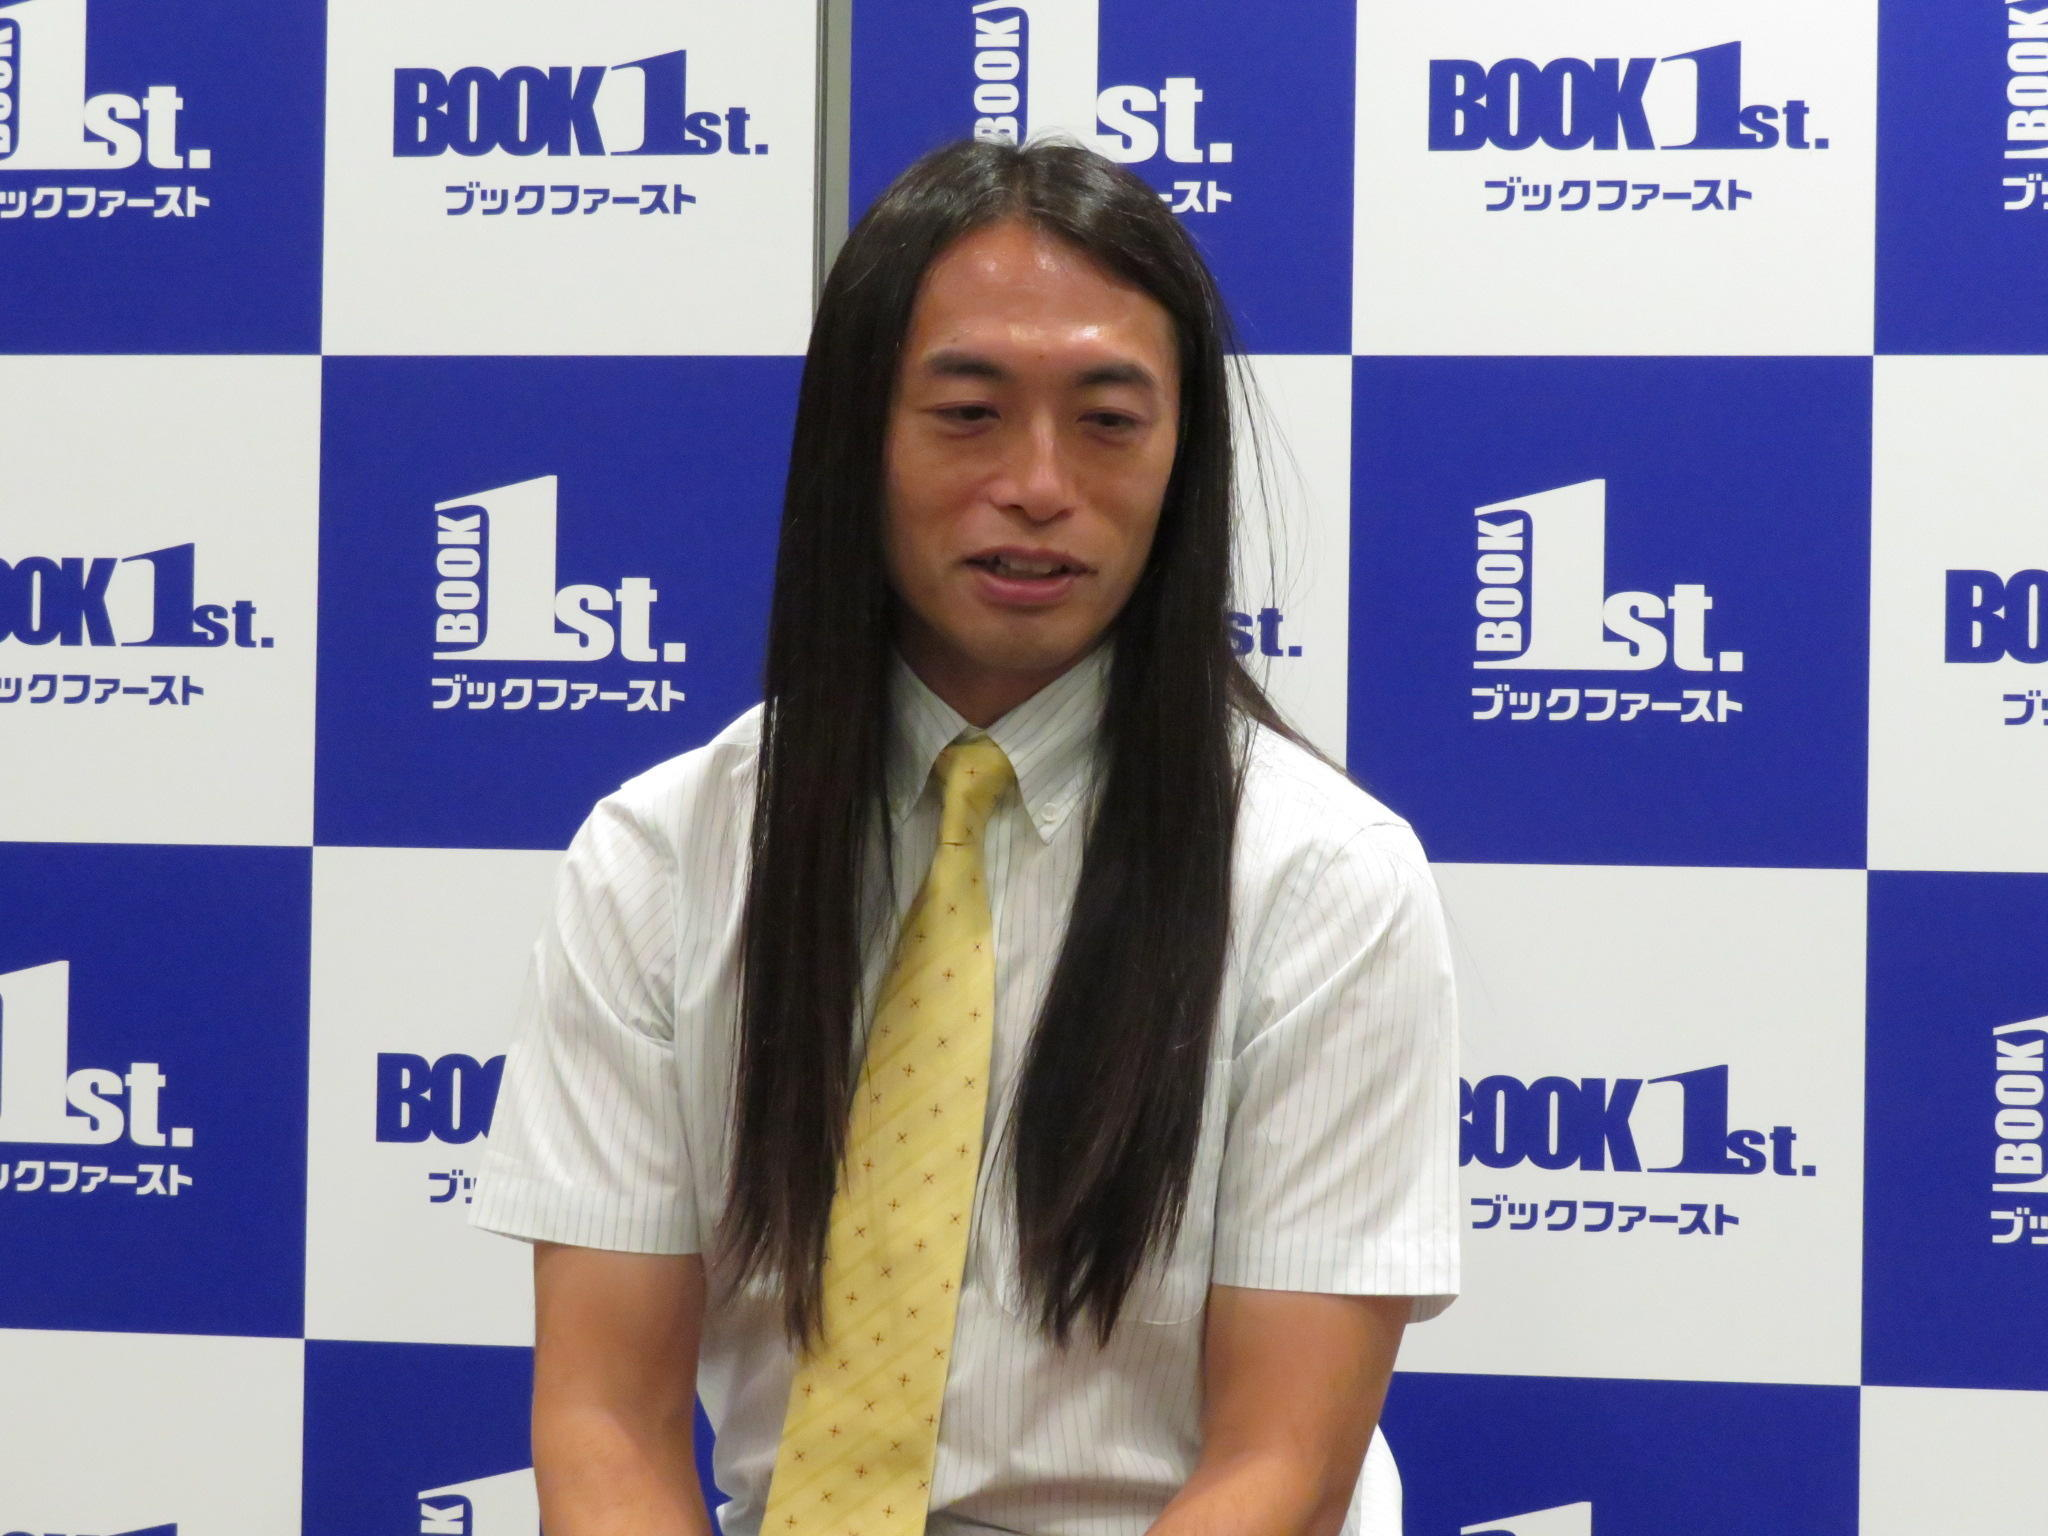 http://news.yoshimoto.co.jp/20180913224715-49d7e9de01844eead3be18c2afa2ae8136a5a4ff.jpg